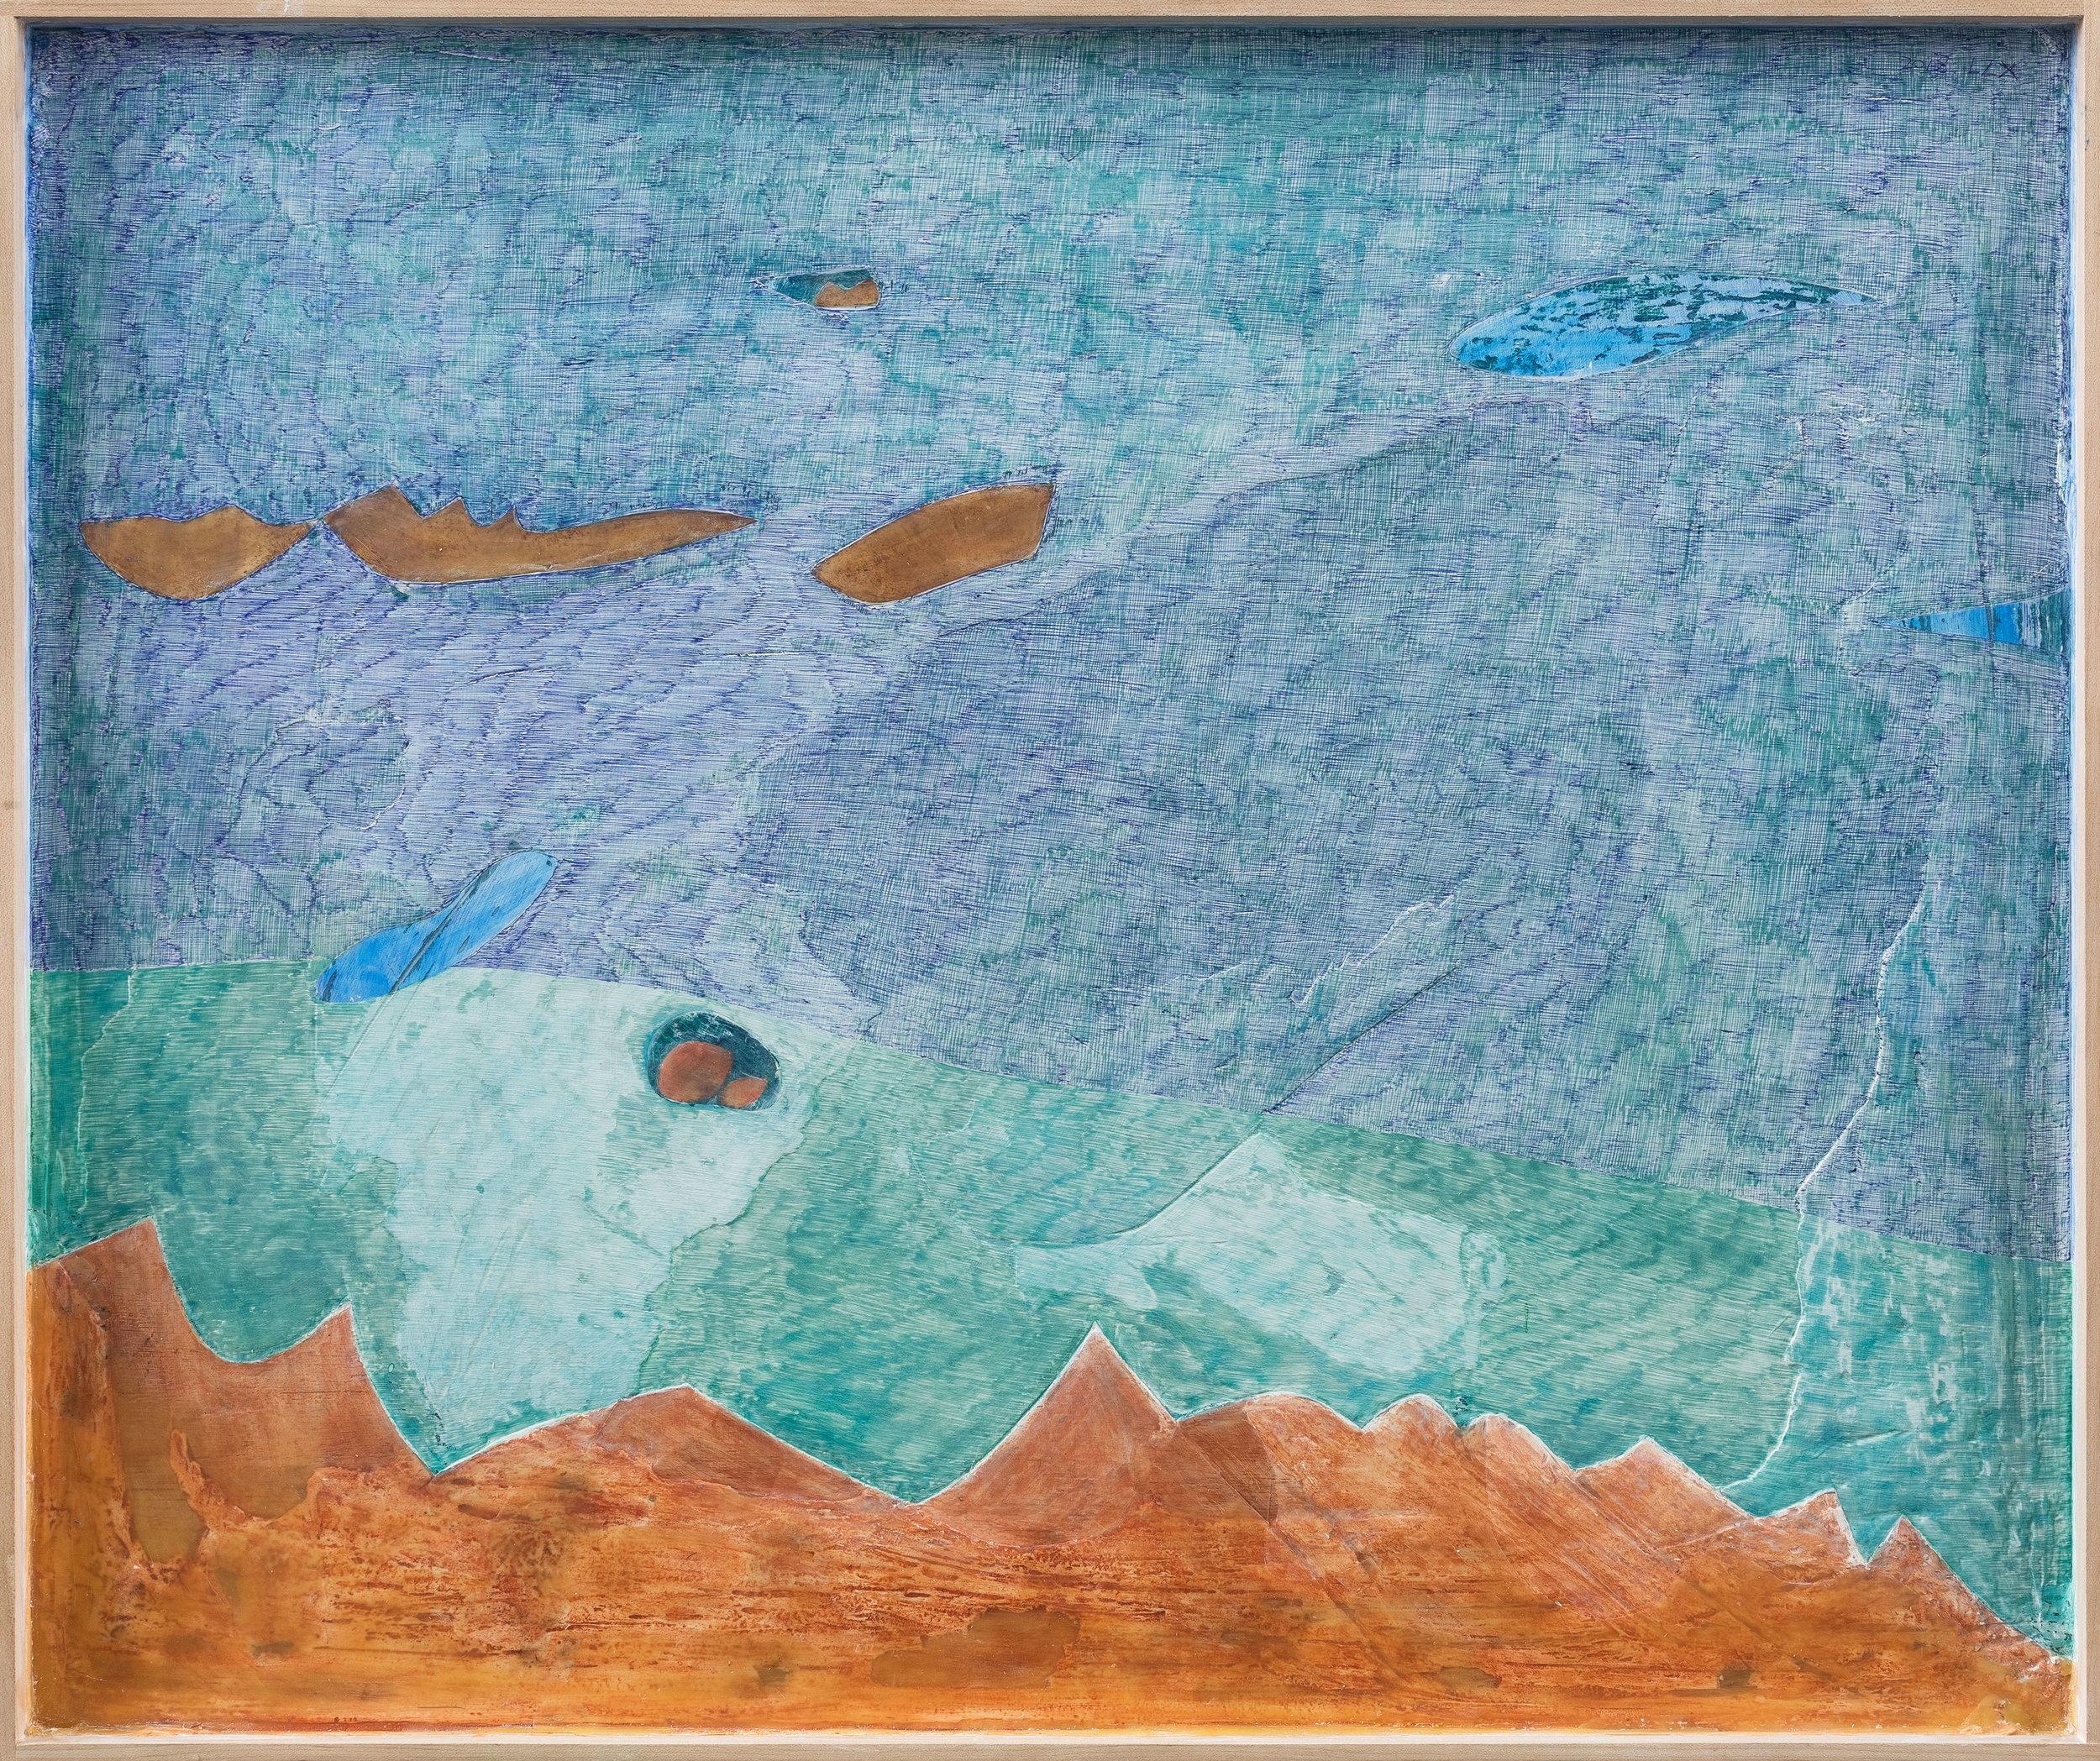 Lan Zhaoxing,  The Ocean , 2018. Plaster, beeswax, acrylic, watercolor, ballpoint pen, 19.6 x 23.6 inch © Lan Zhaoxing, courtesy Fou Gallery